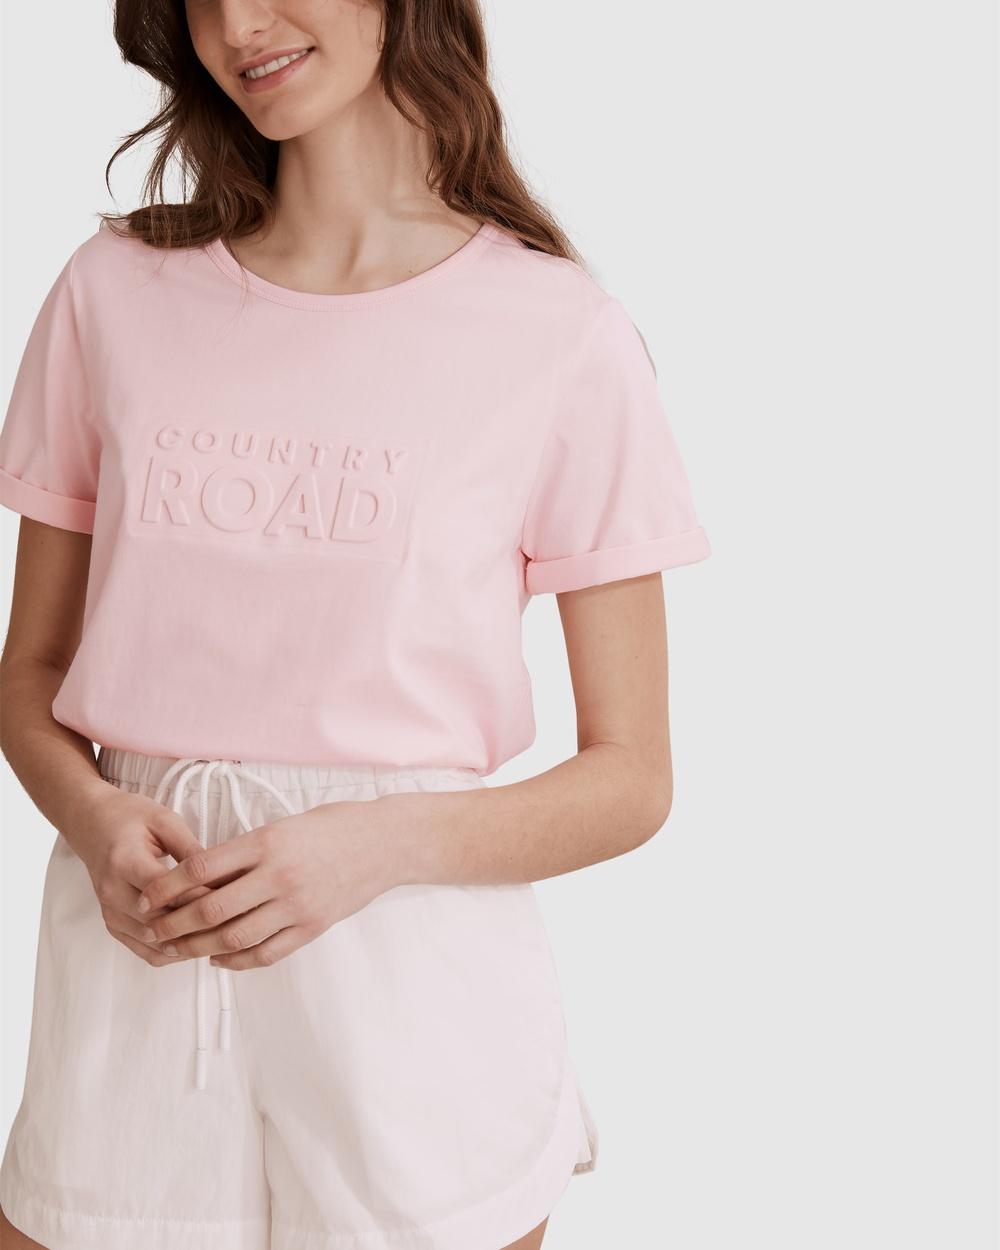 Country Road Verified Australian Cotton Modern Embossed T shirt T-Shirts & Singlets pink T-shirt Australia